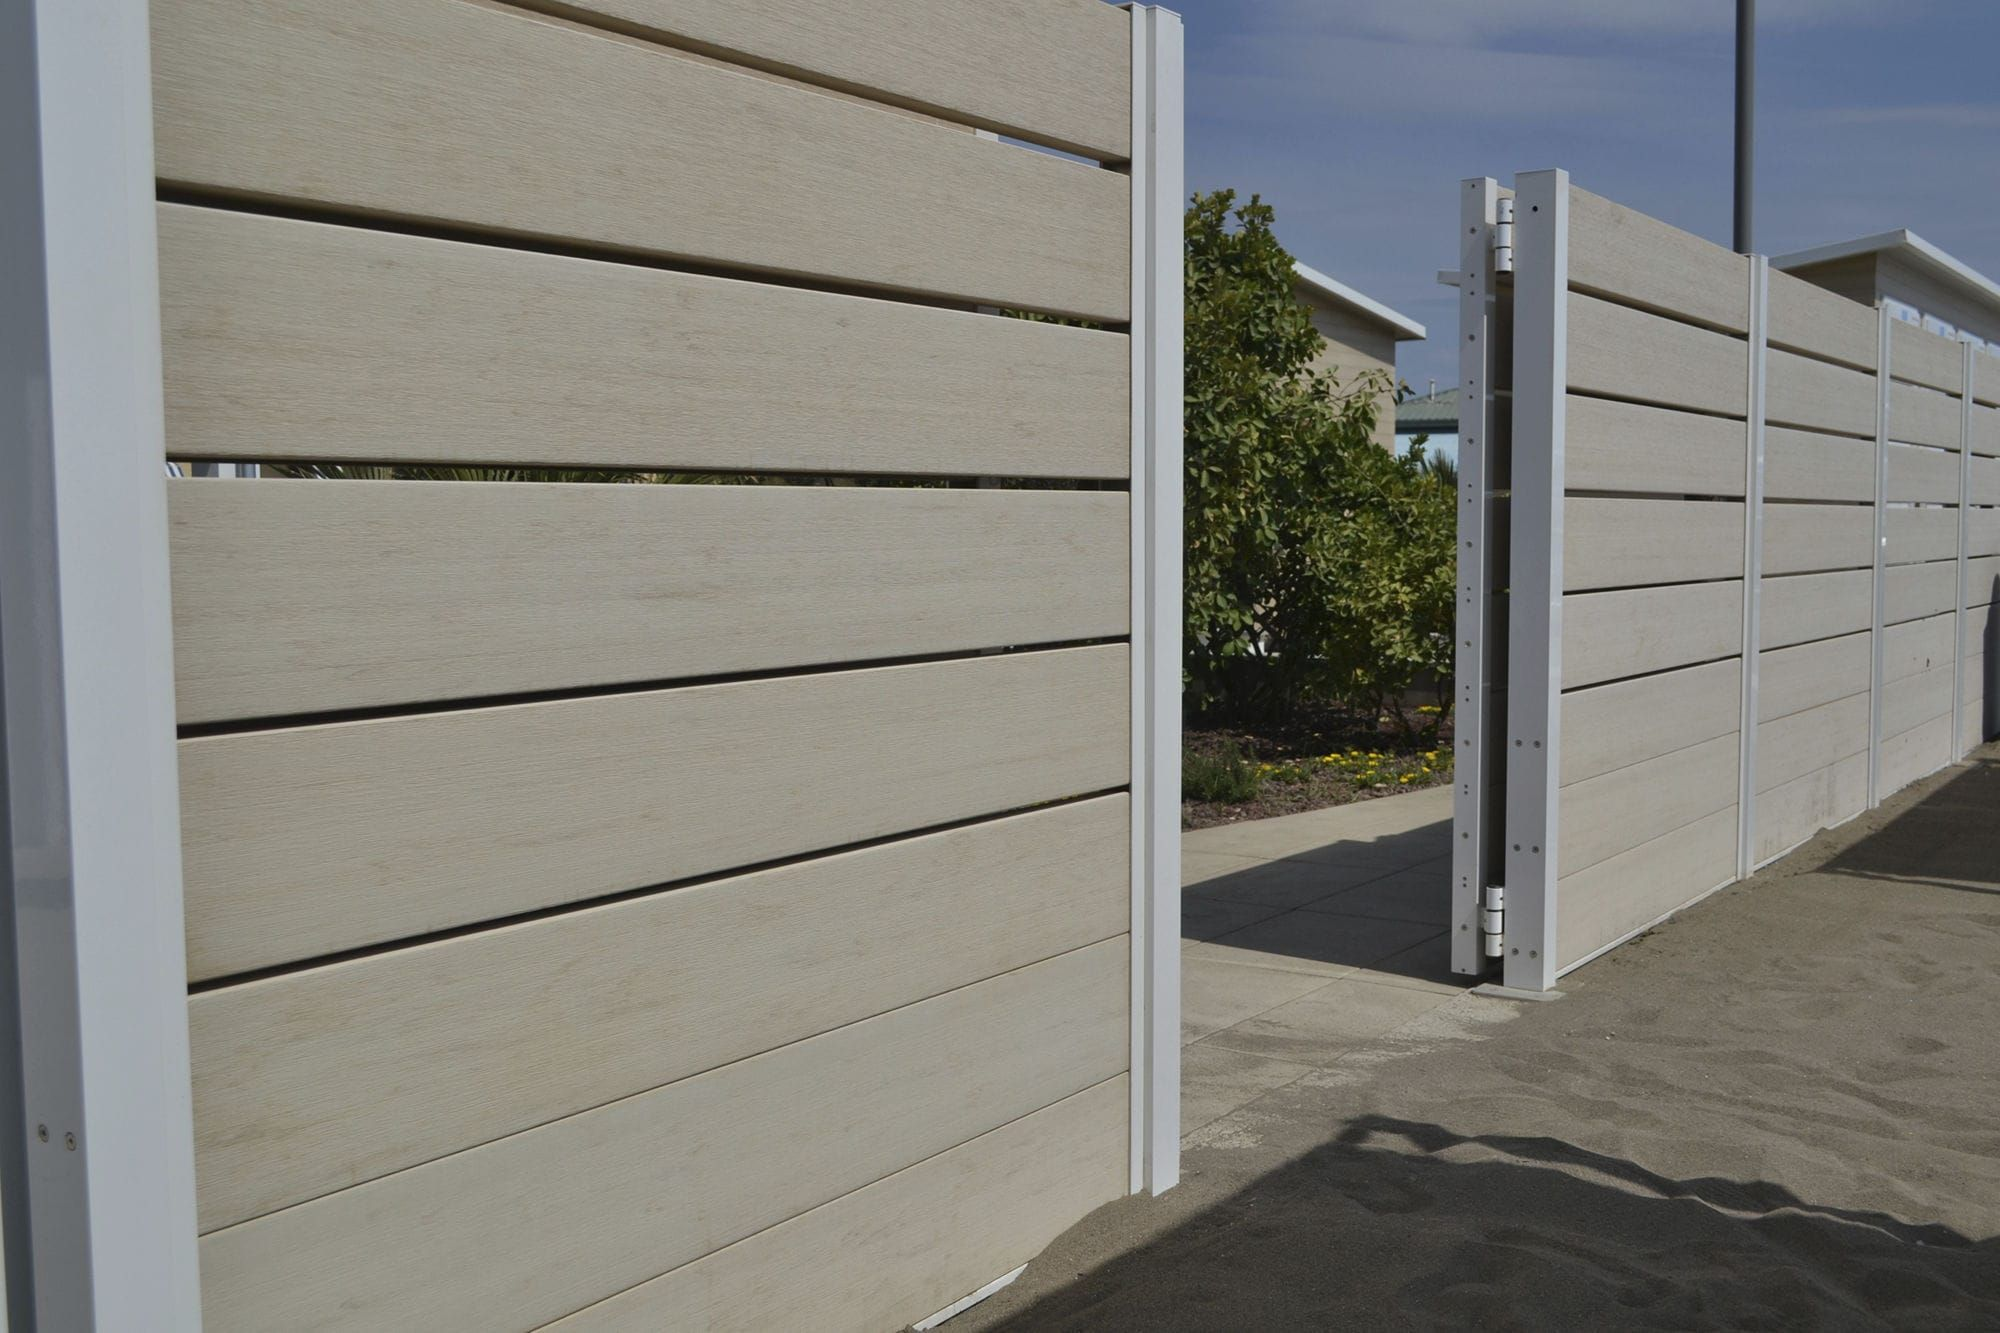 wood composite fence spainwood cladding exterior for farm fence buildings